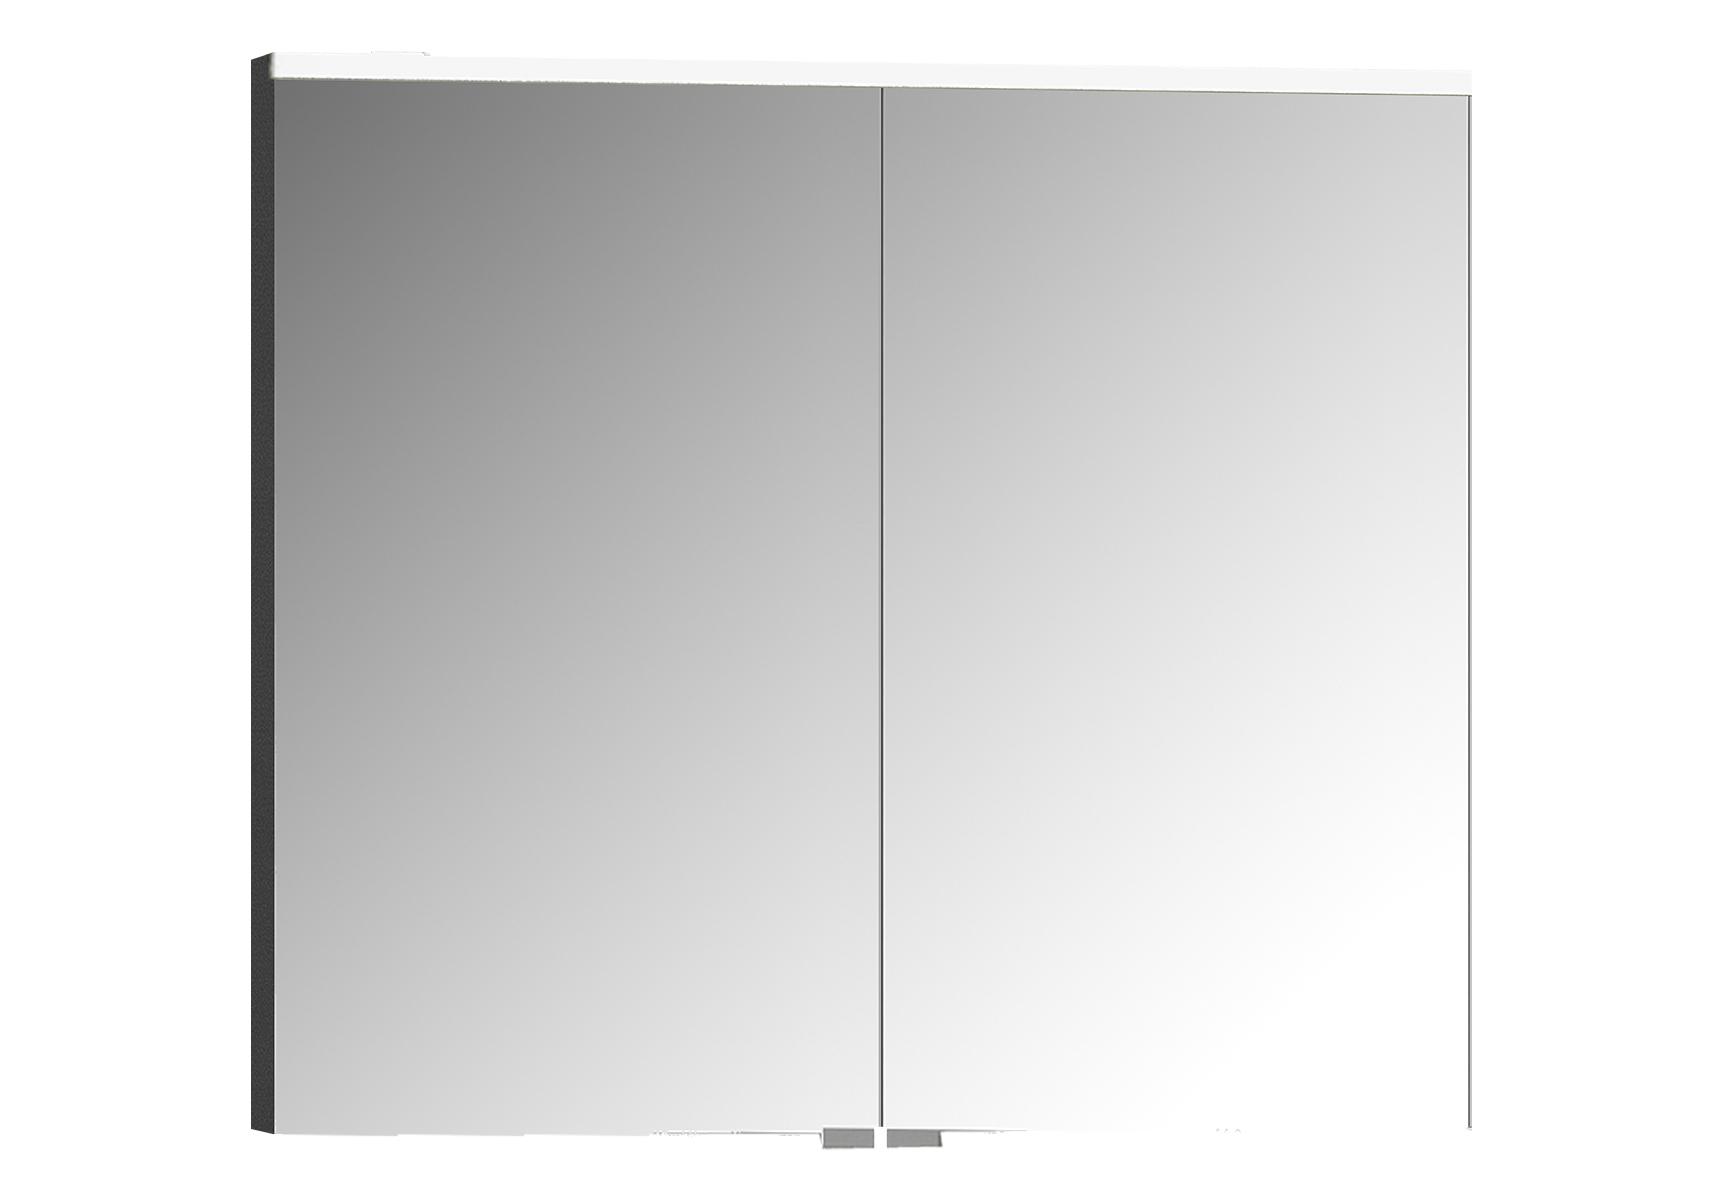 Integra Premiumarmoire de toilette, 80 cm, éclairage LED horizontale,anthraciteacite haute brilliance, 2 portes